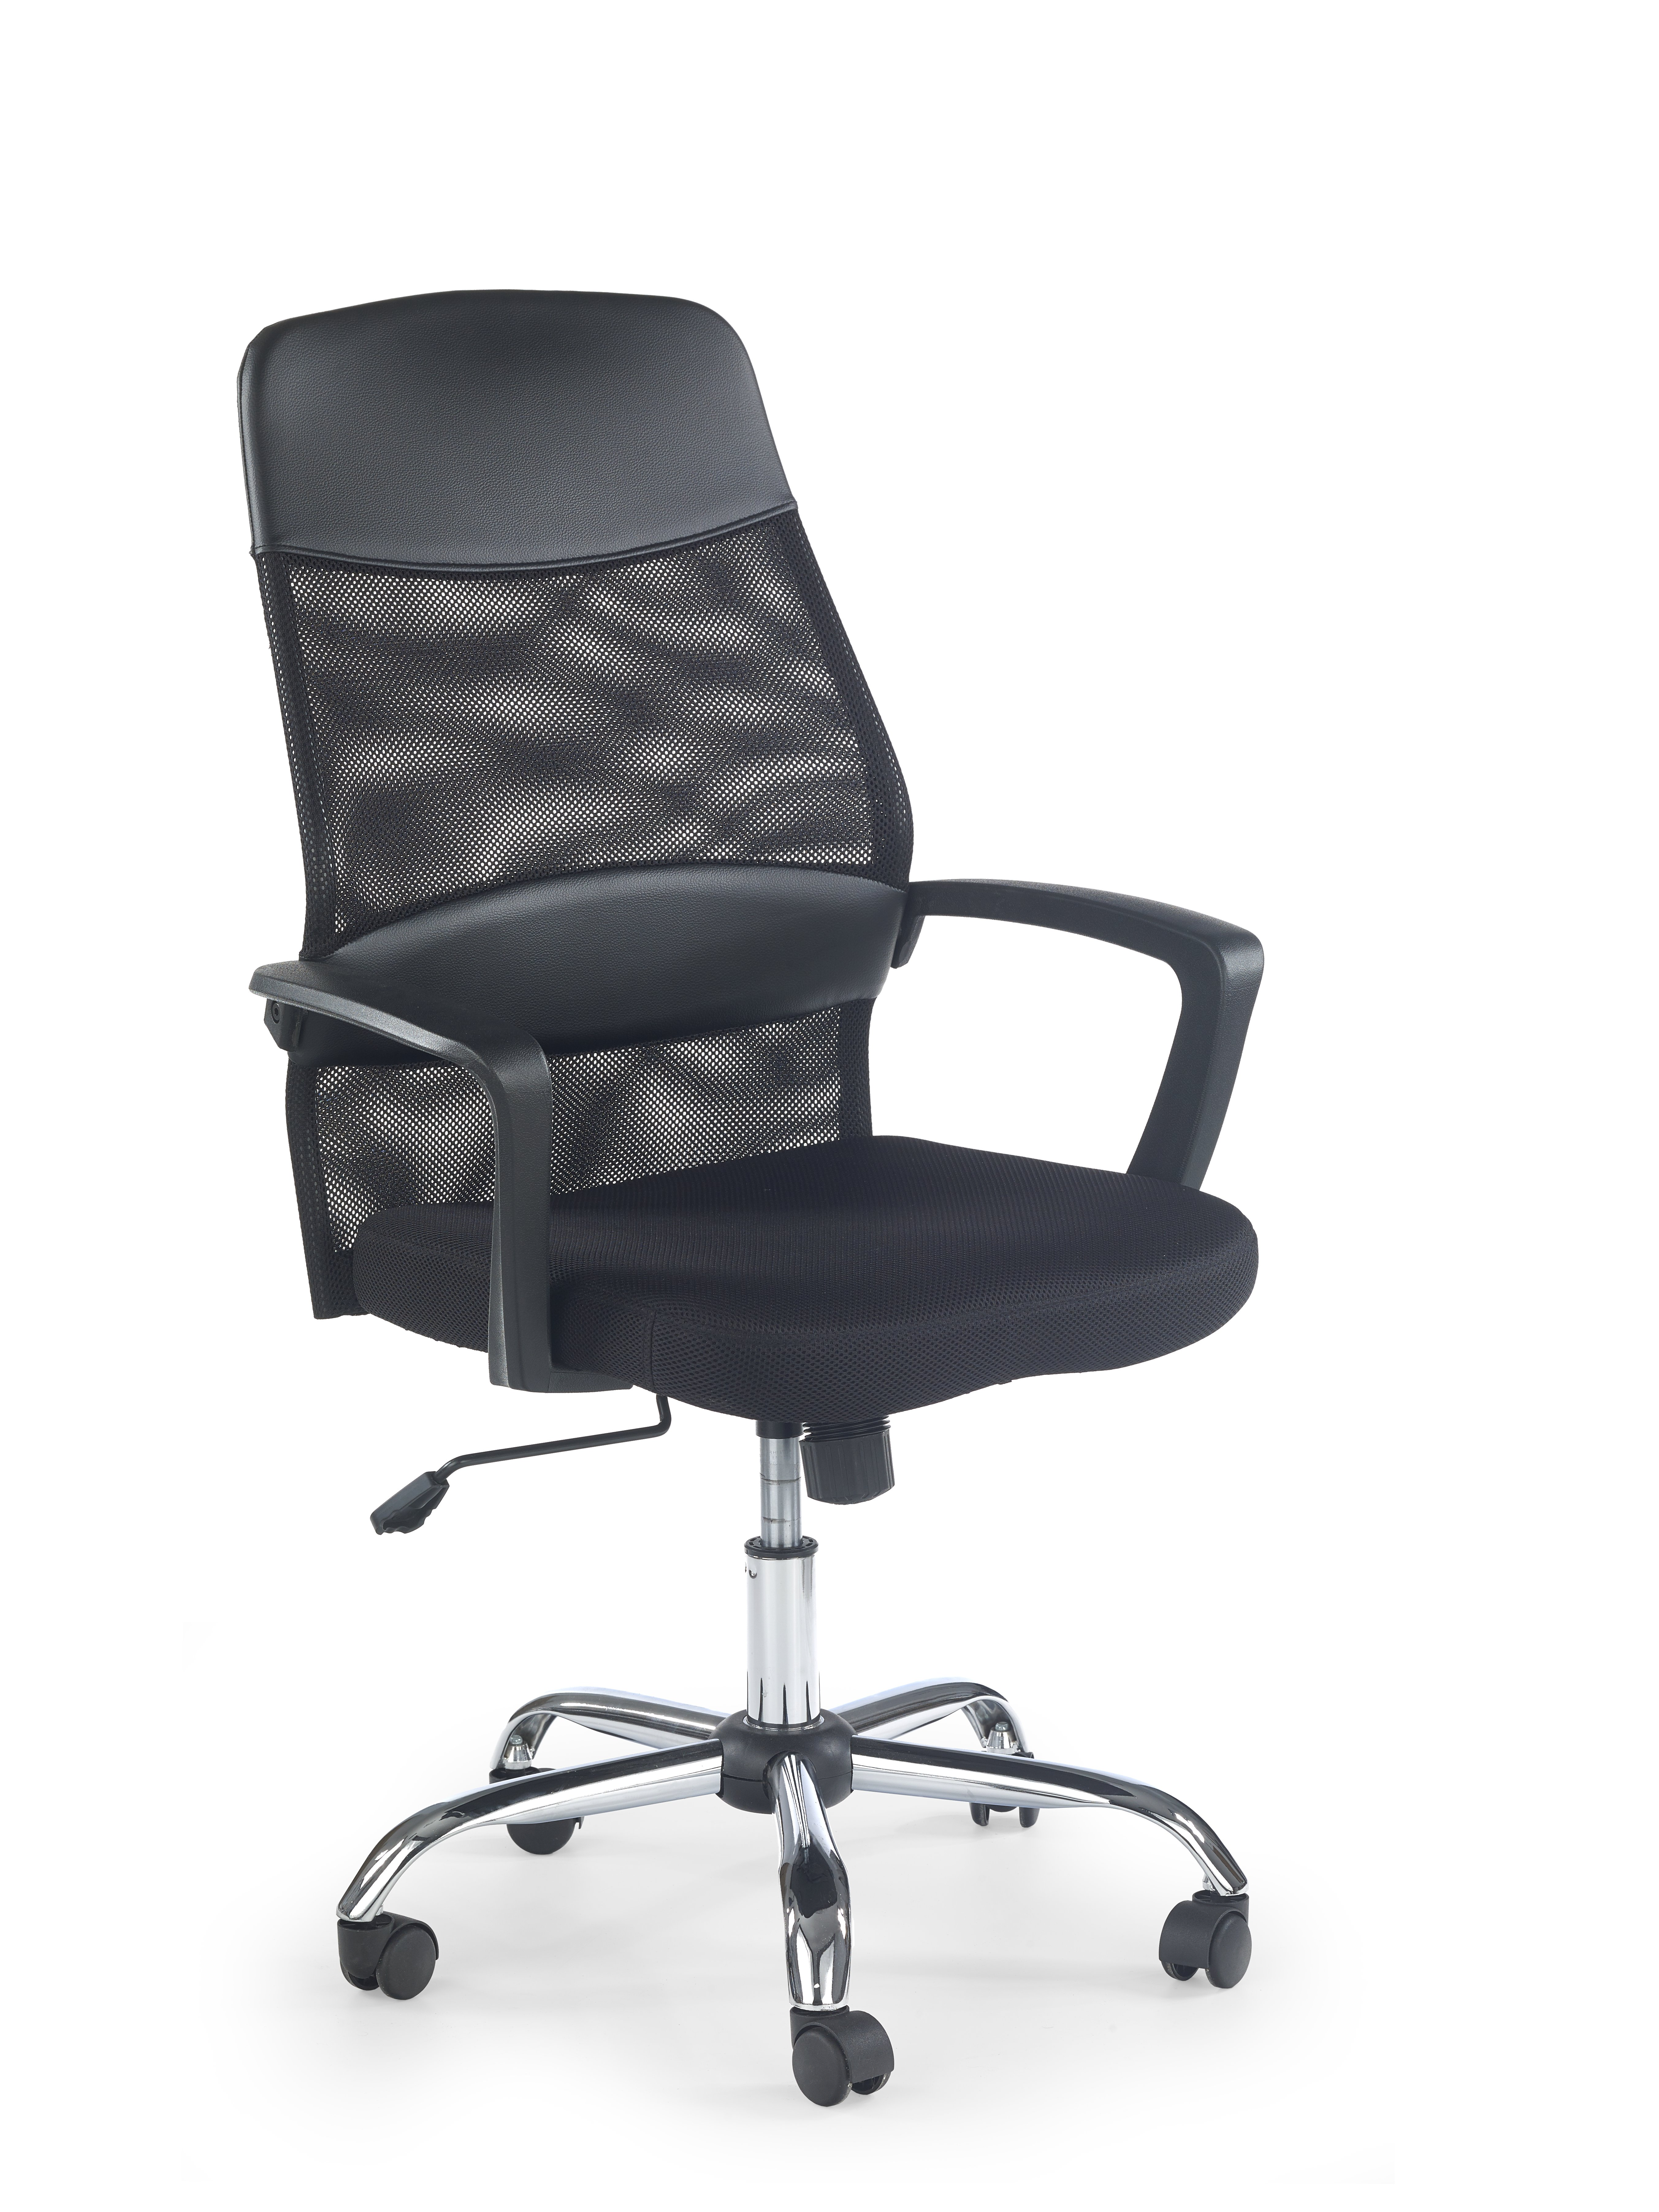 Scaun de birou ergonomic Carbon Black poza